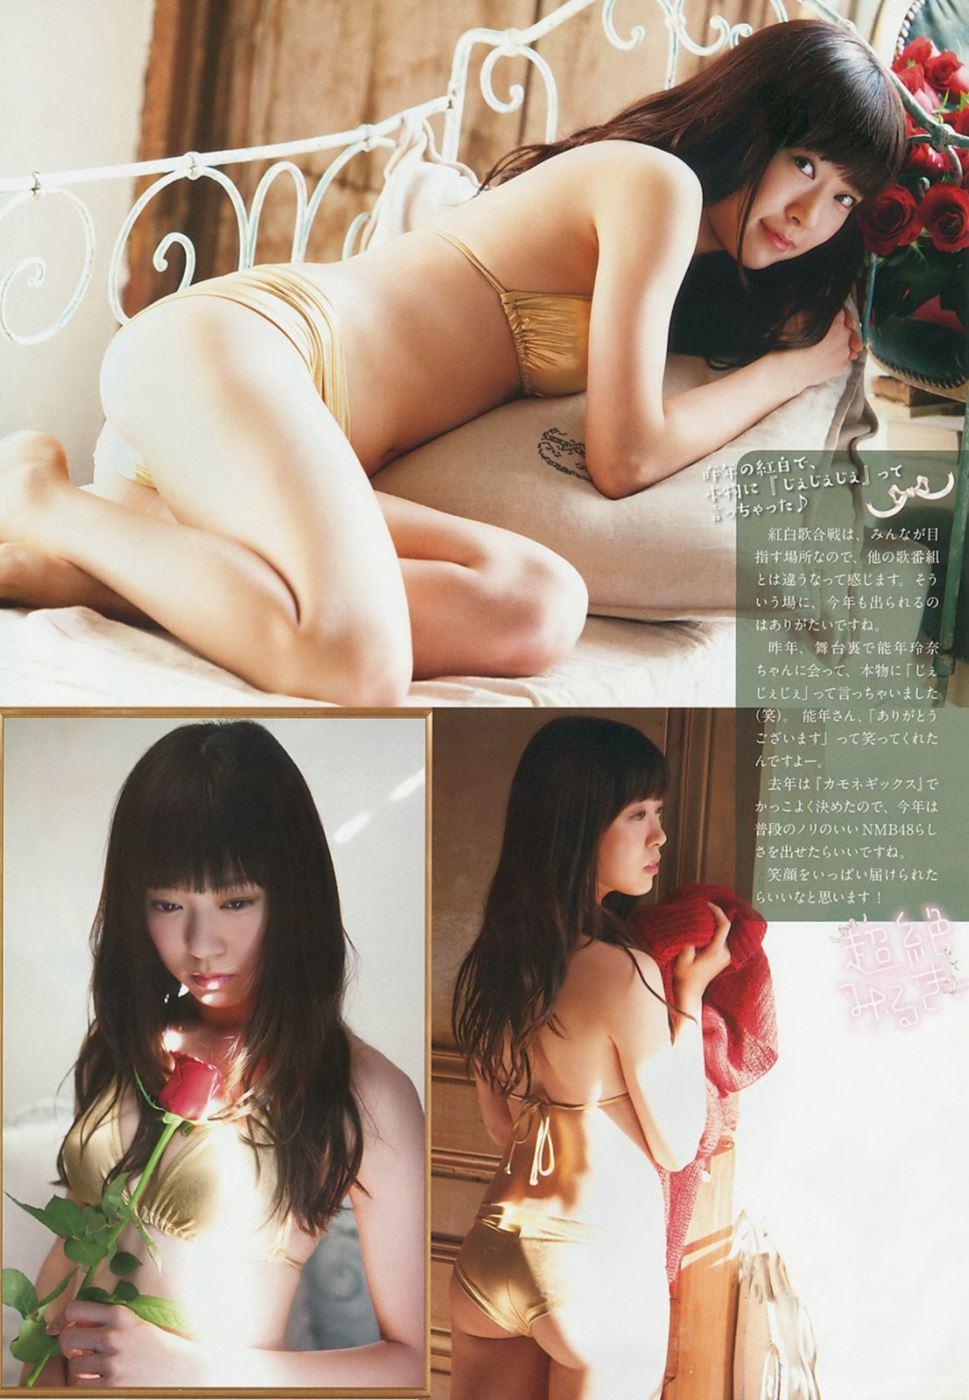 渡辺美優紀 エロ画像 63